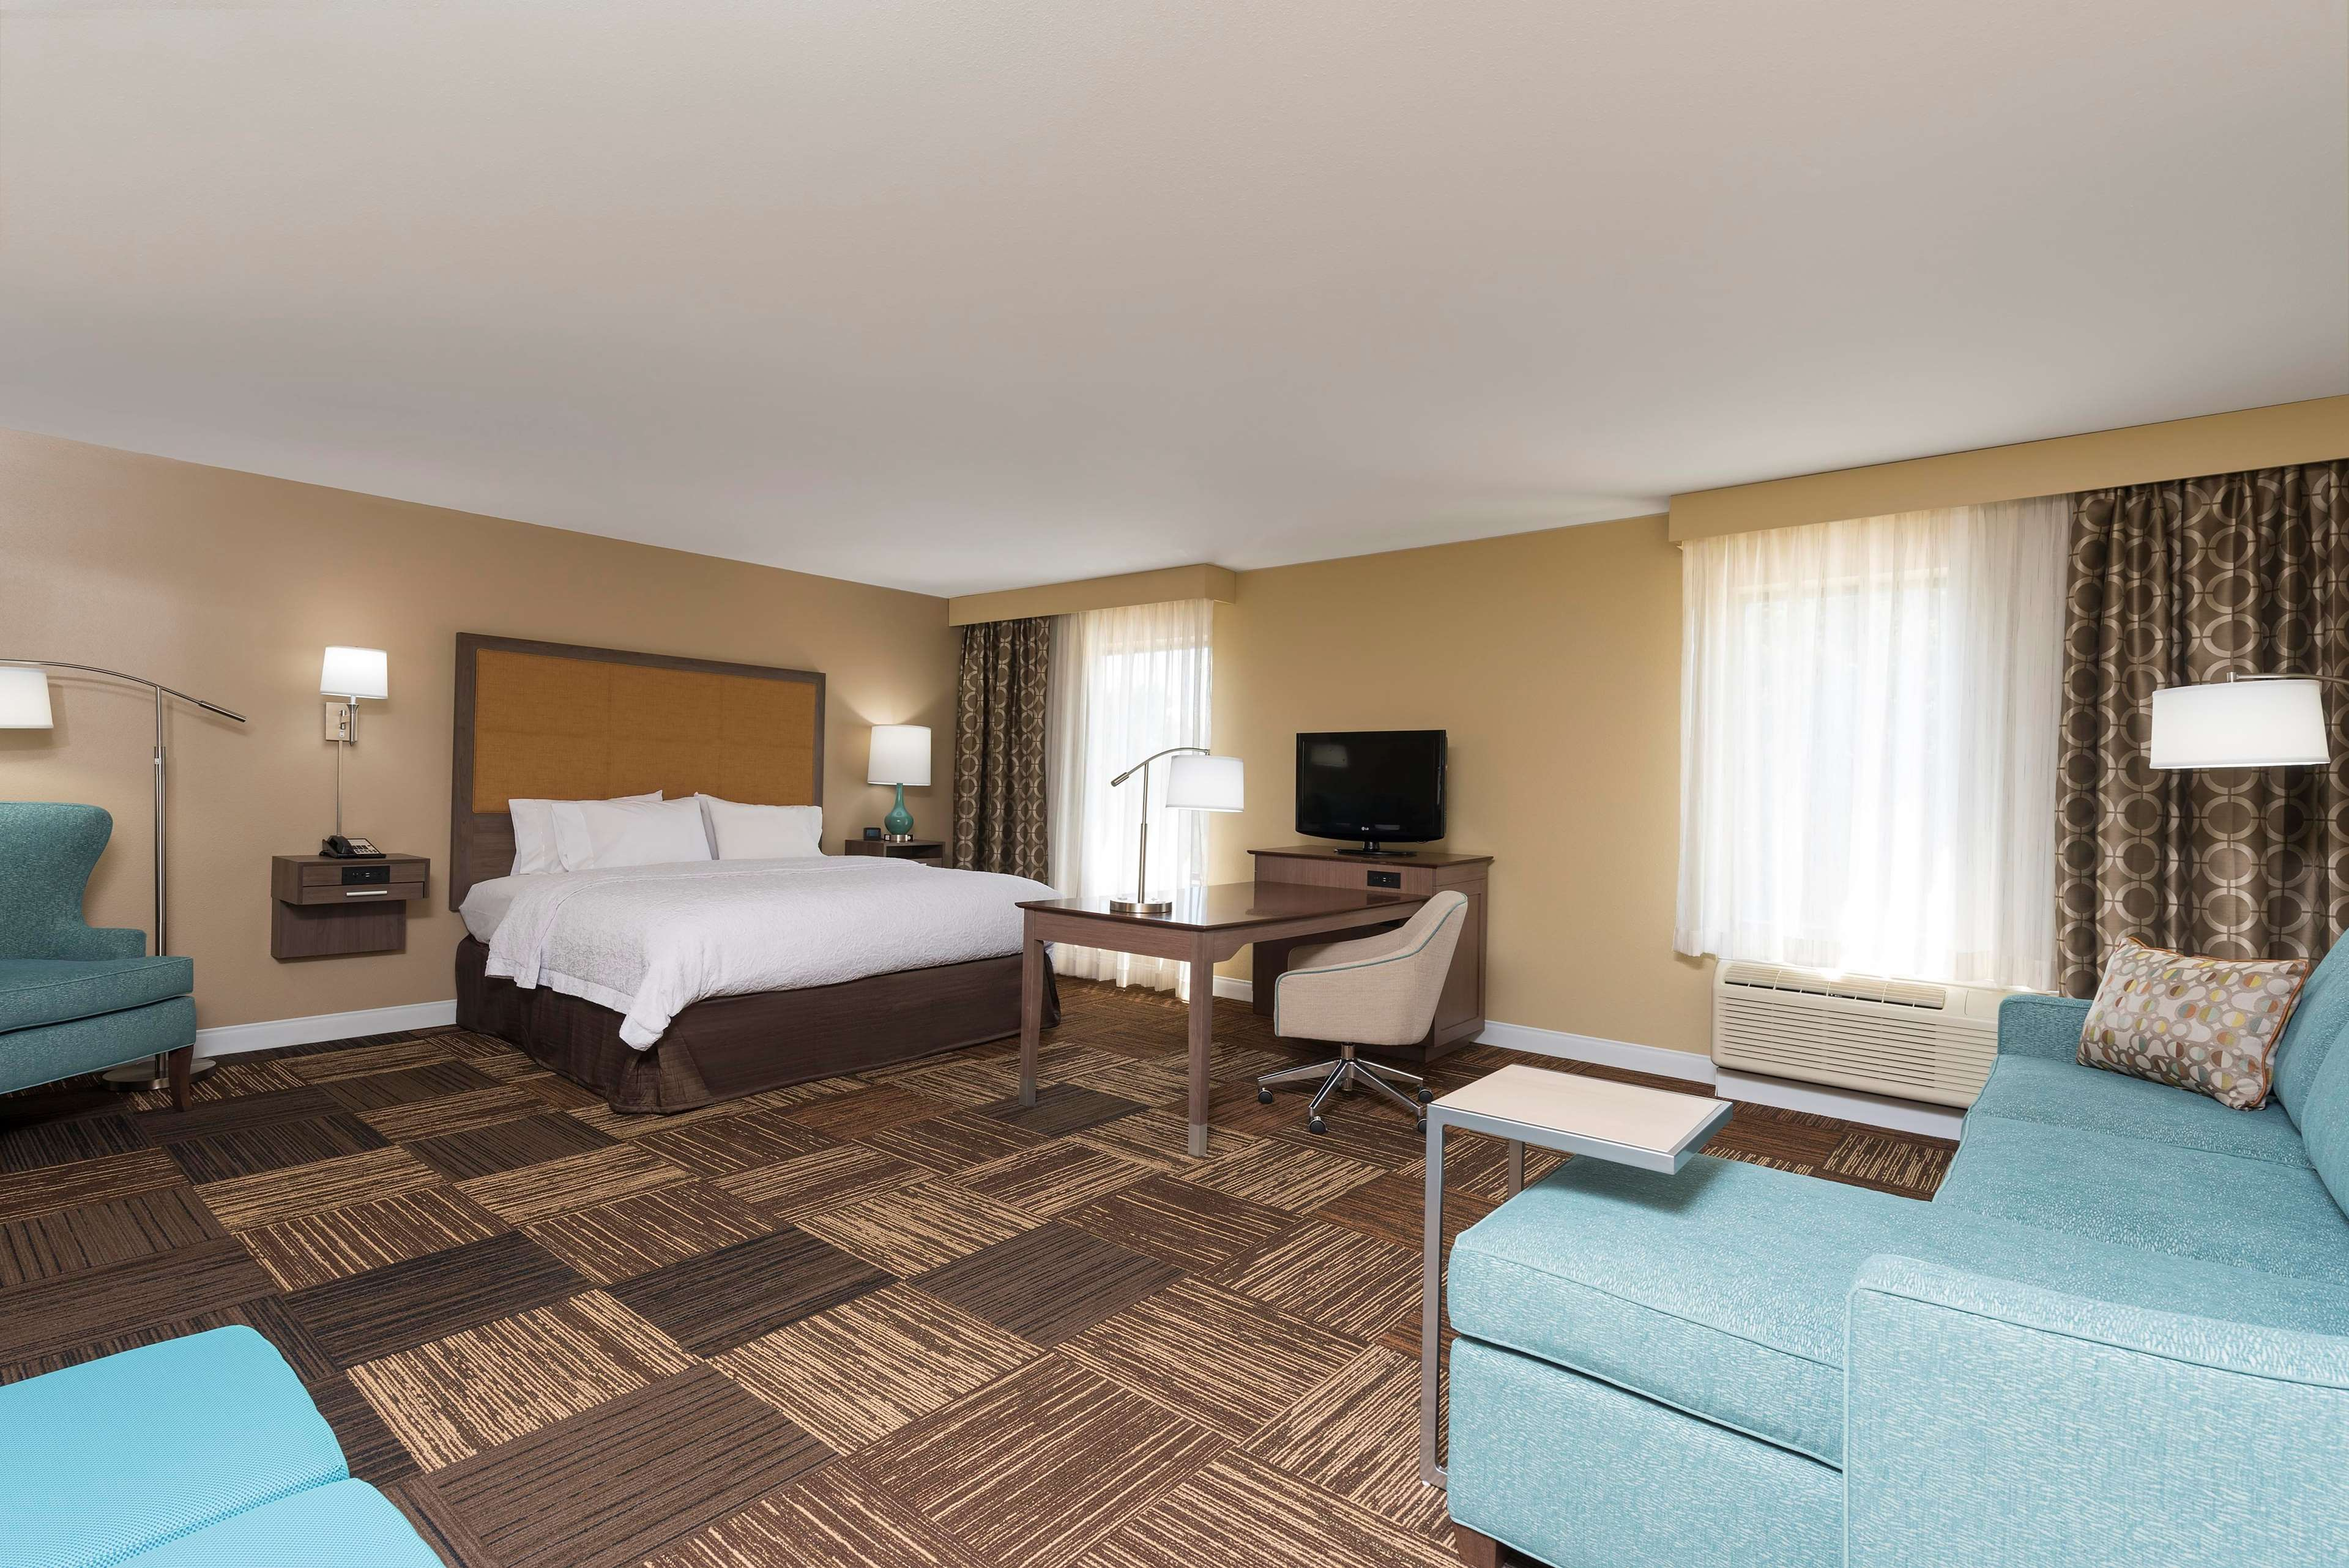 Hampton Inn & Suites Mansfield-South @ I-71 image 25